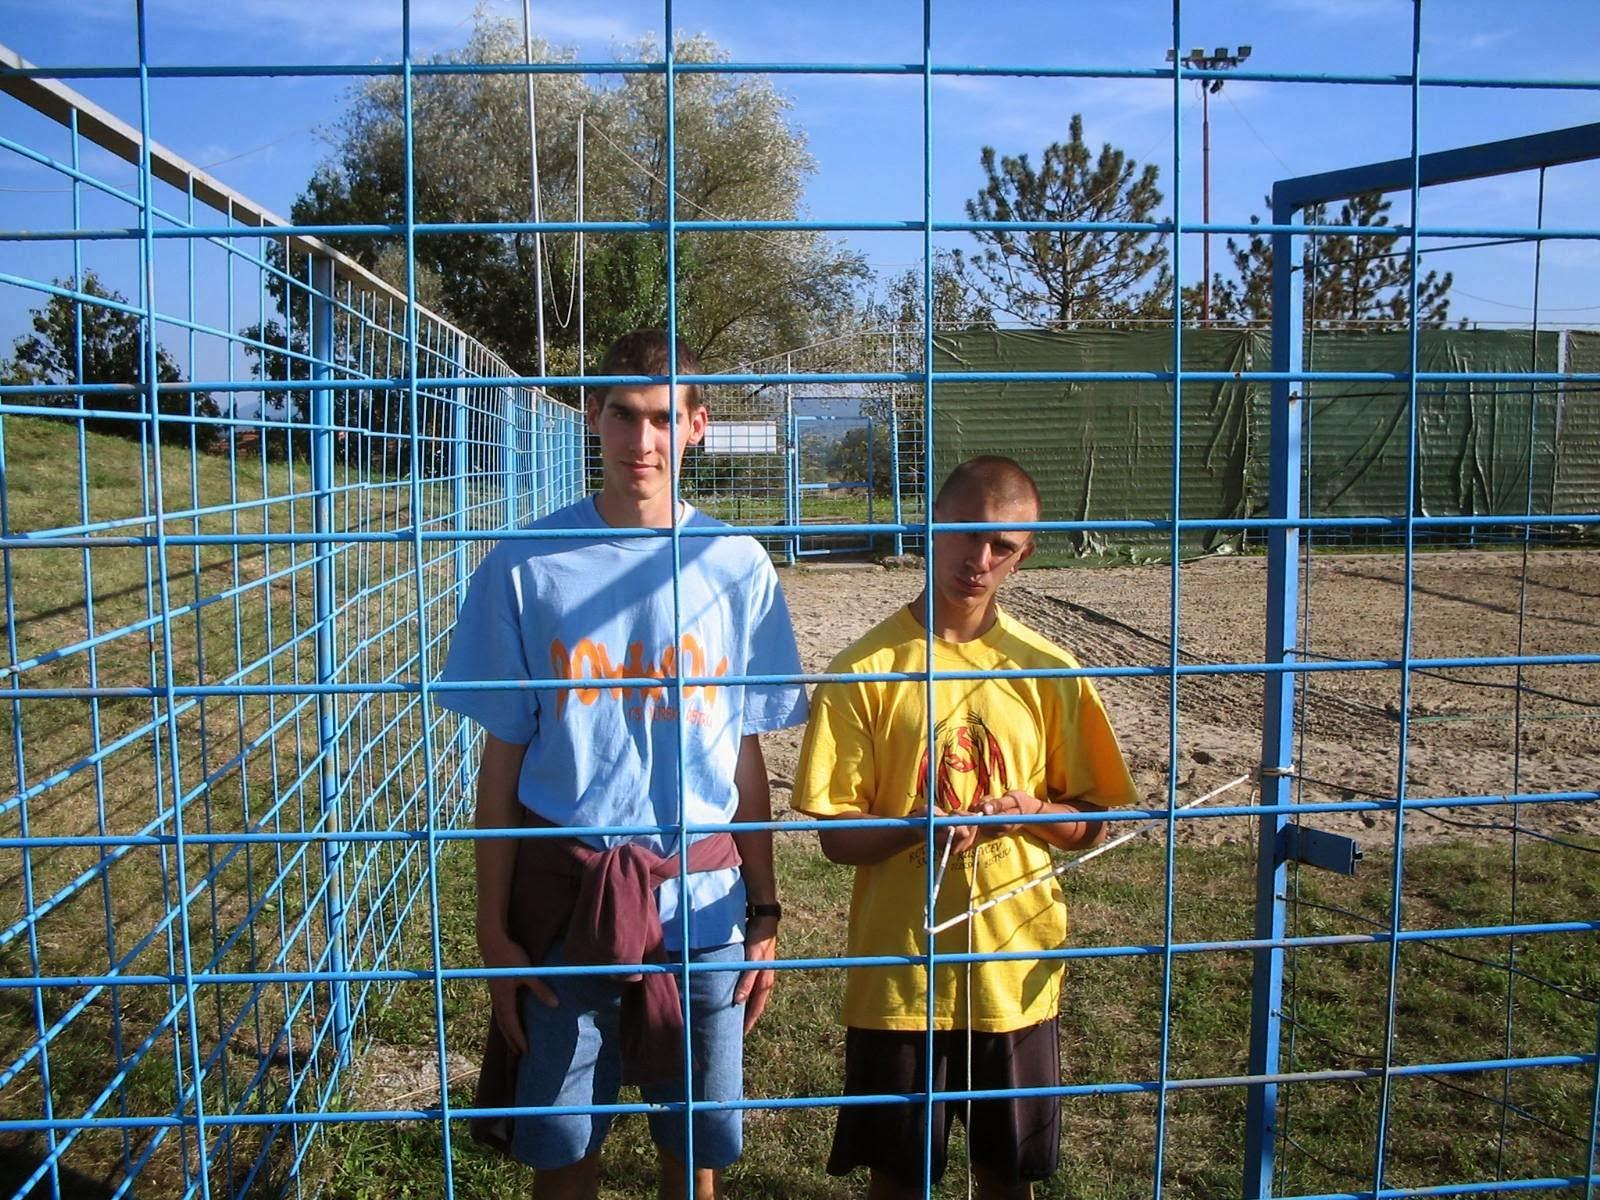 TOTeM, Ilirska Bistrica 2004 - 111_1101.JPG